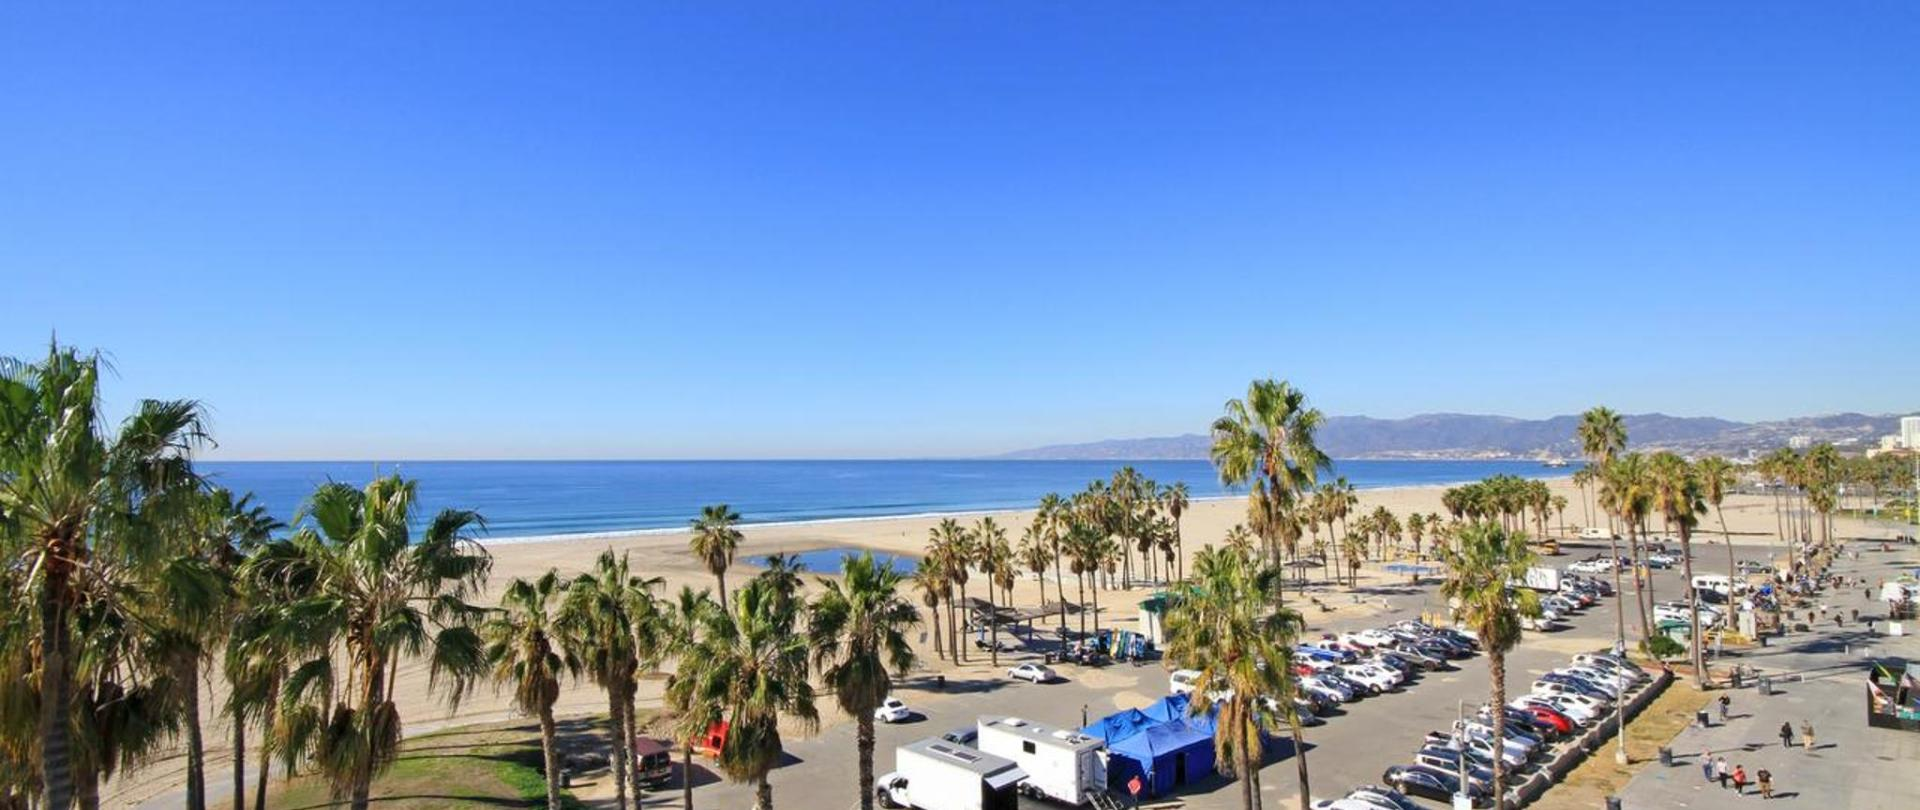 Hotel Venice Beach Los Angeles